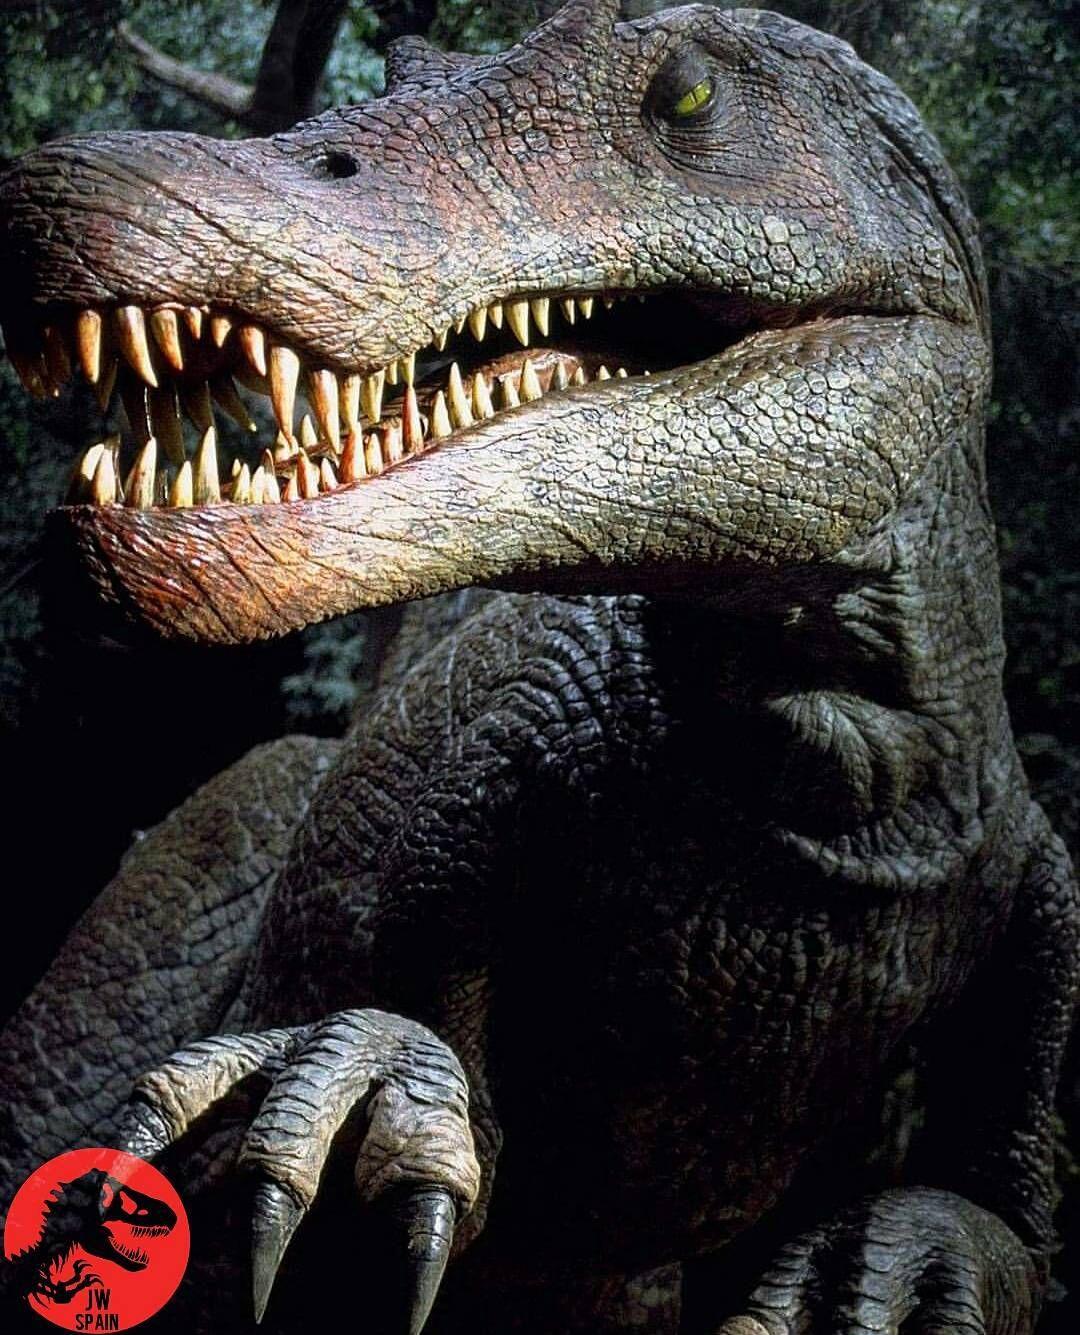 Animatronic Spinosaurus Jurassic Park 3 spinosaurus